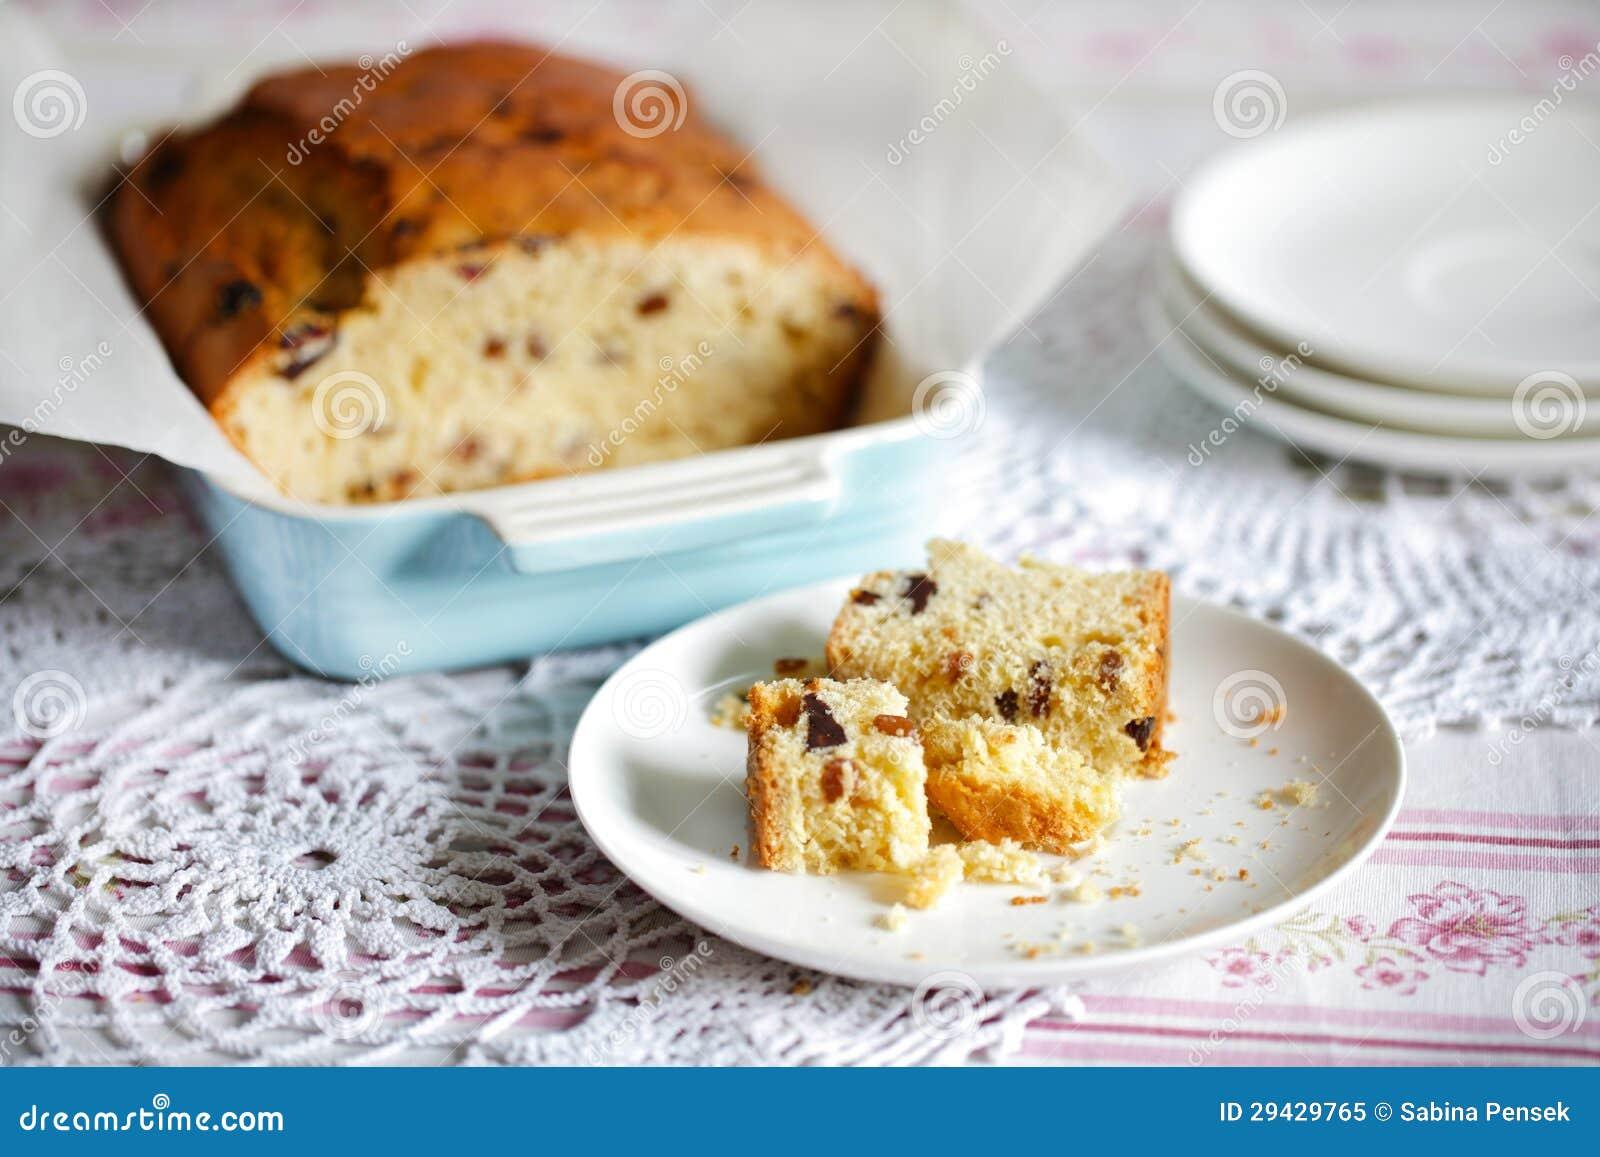 Oatmeal Pound Cake